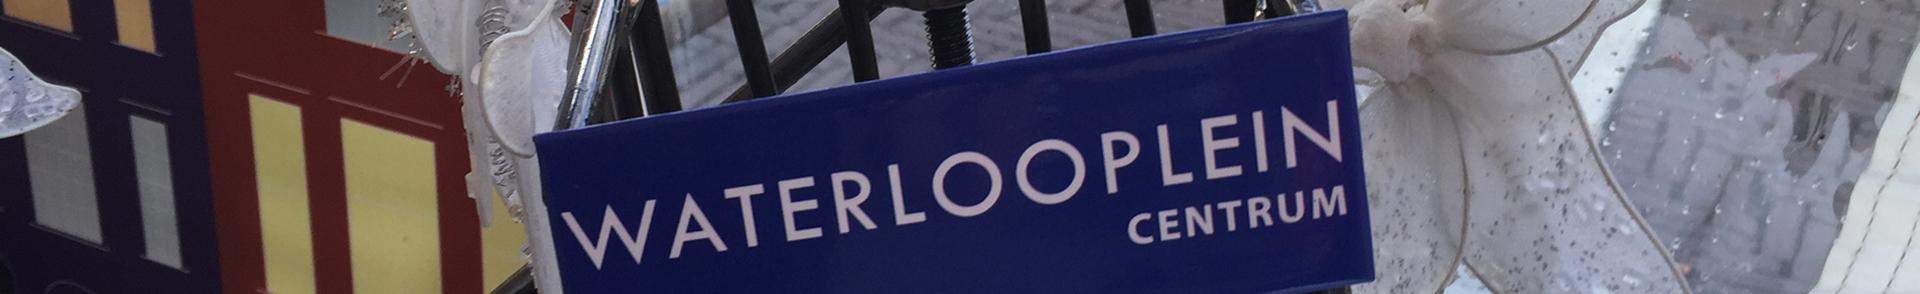 waterlooplein-straatnaambord